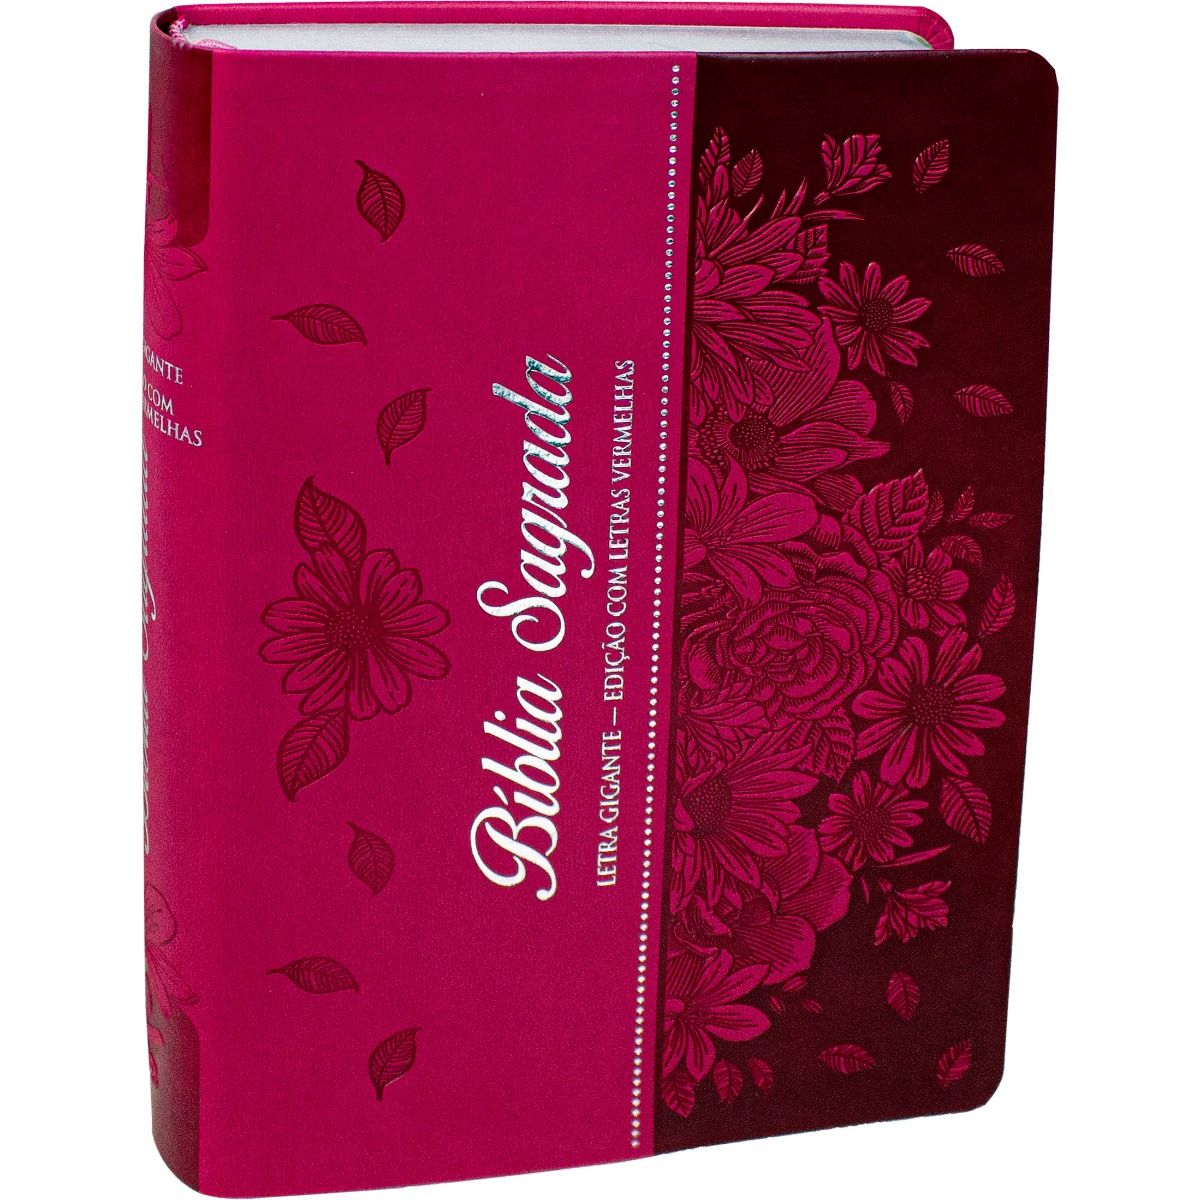 Bíblia Letra Gigante ARC Com Indice Pink Flor